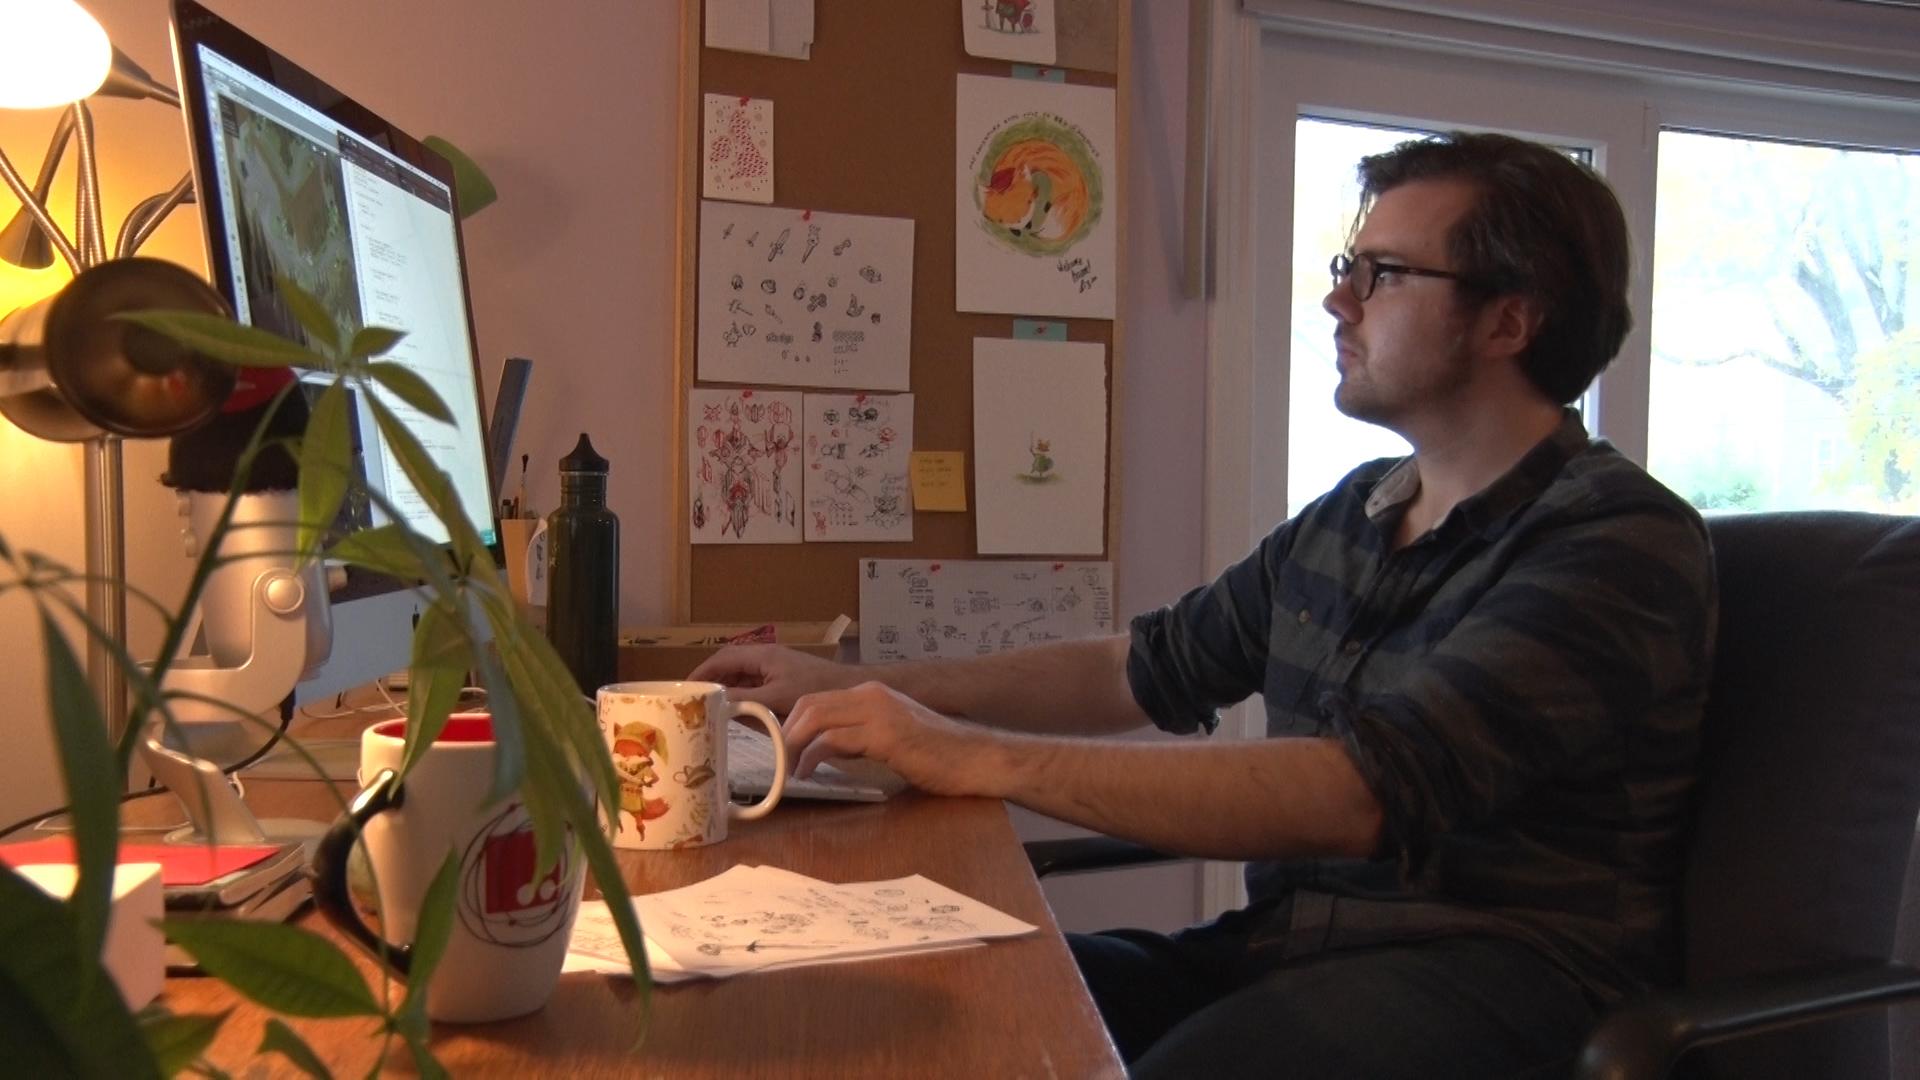 Andrew Shouldice working on Secret Legend from home.